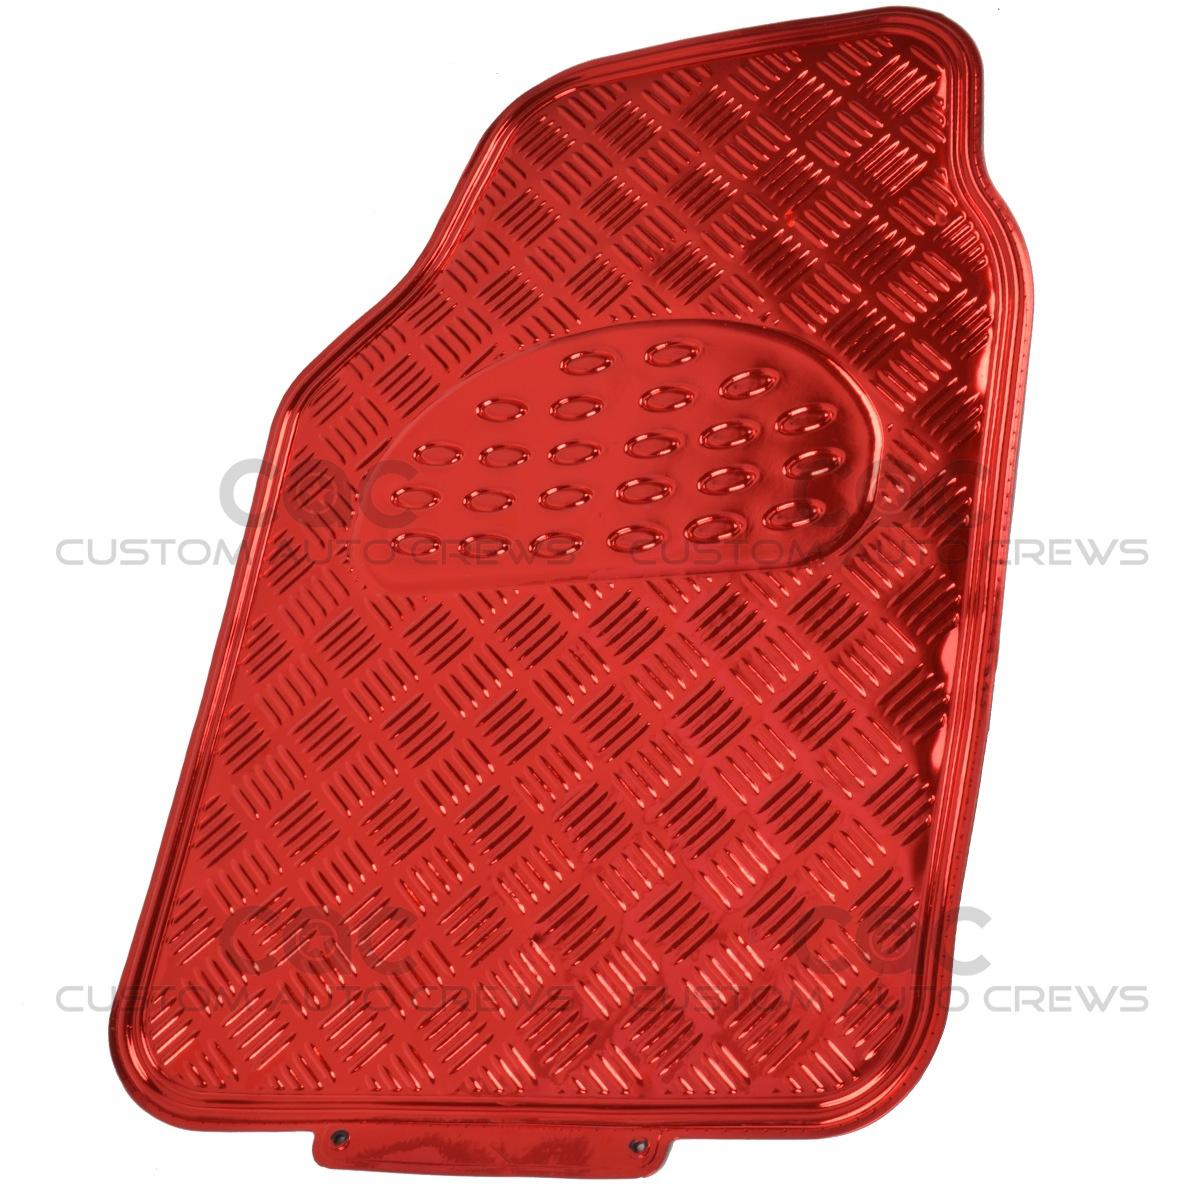 Rubber queen floor mats - Red Metallic Rubber Floor Mats Set 4pc Car